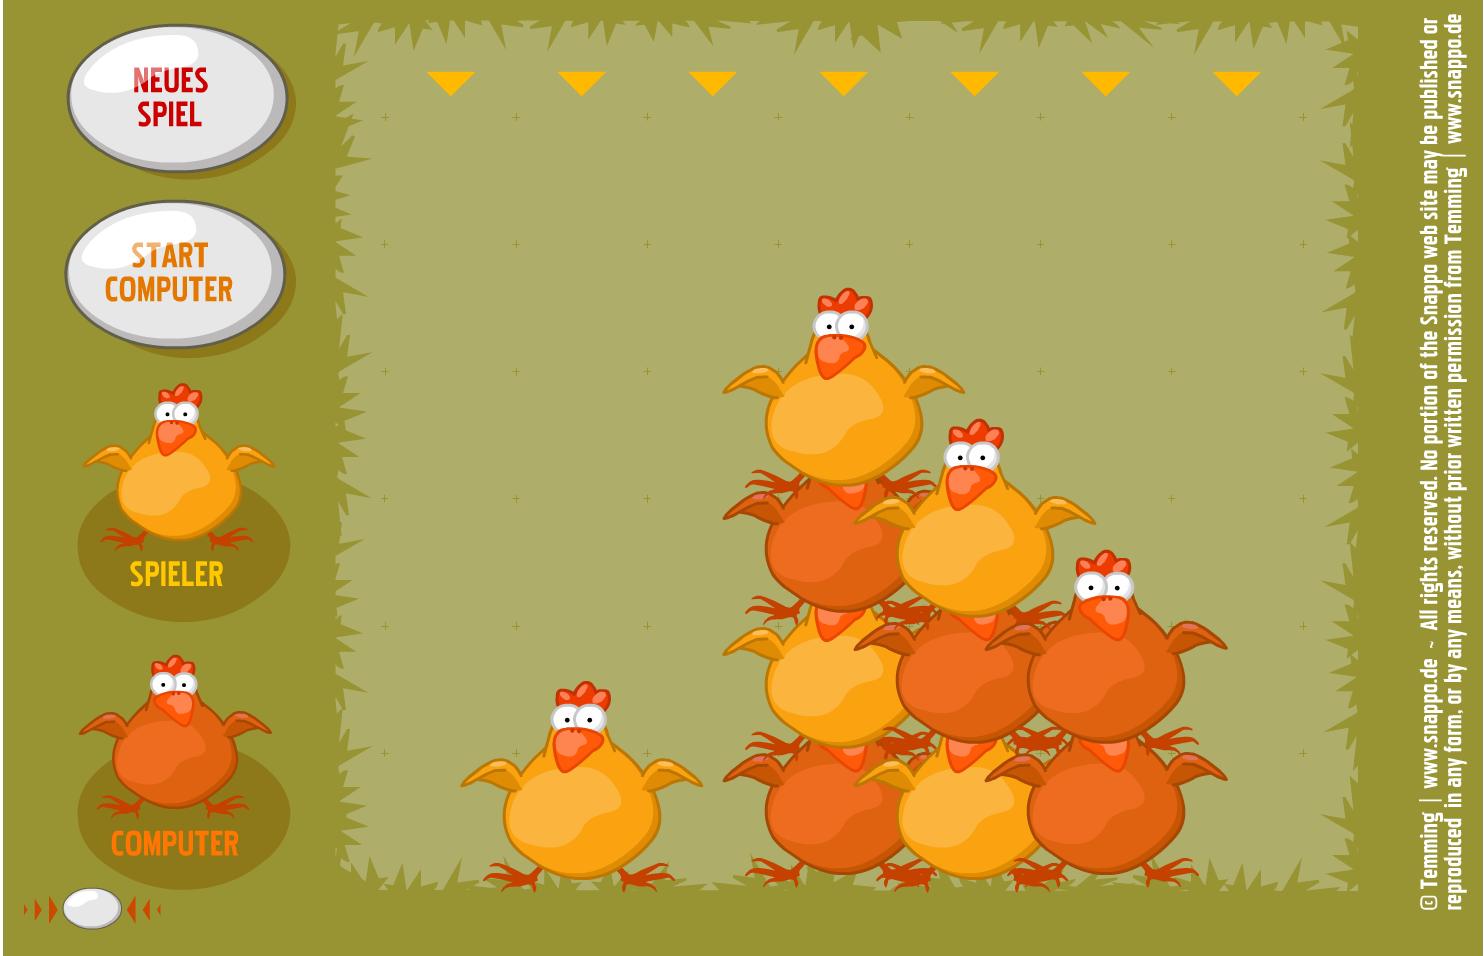 Huhn gewinnt